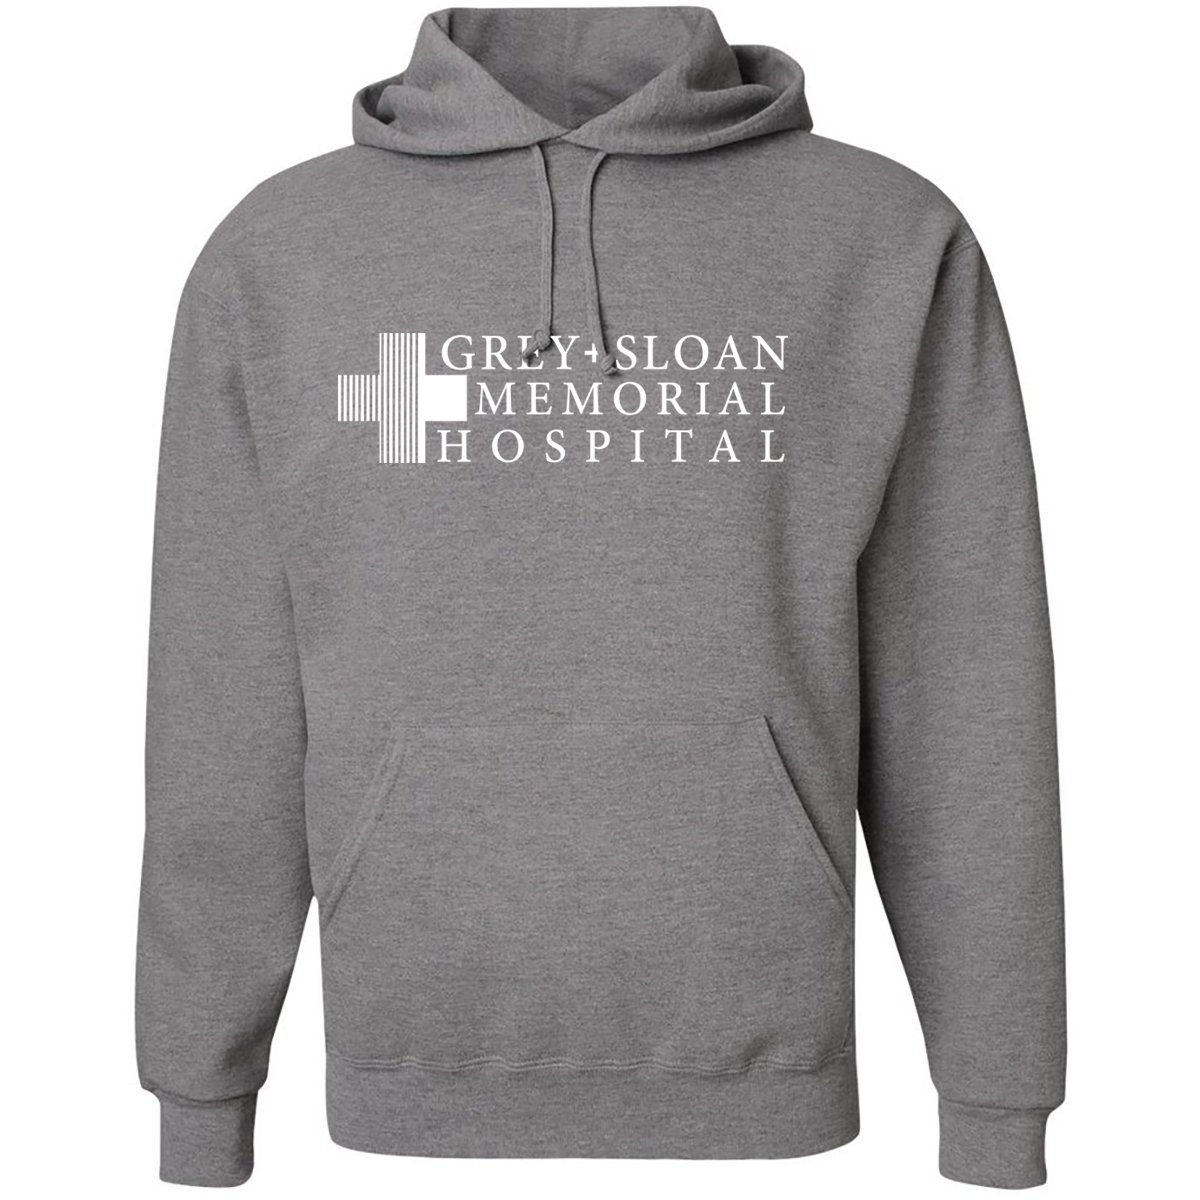 Grey Sloan Memorial Hospital Hooded Sweater Pullover Premium Qu Shirts